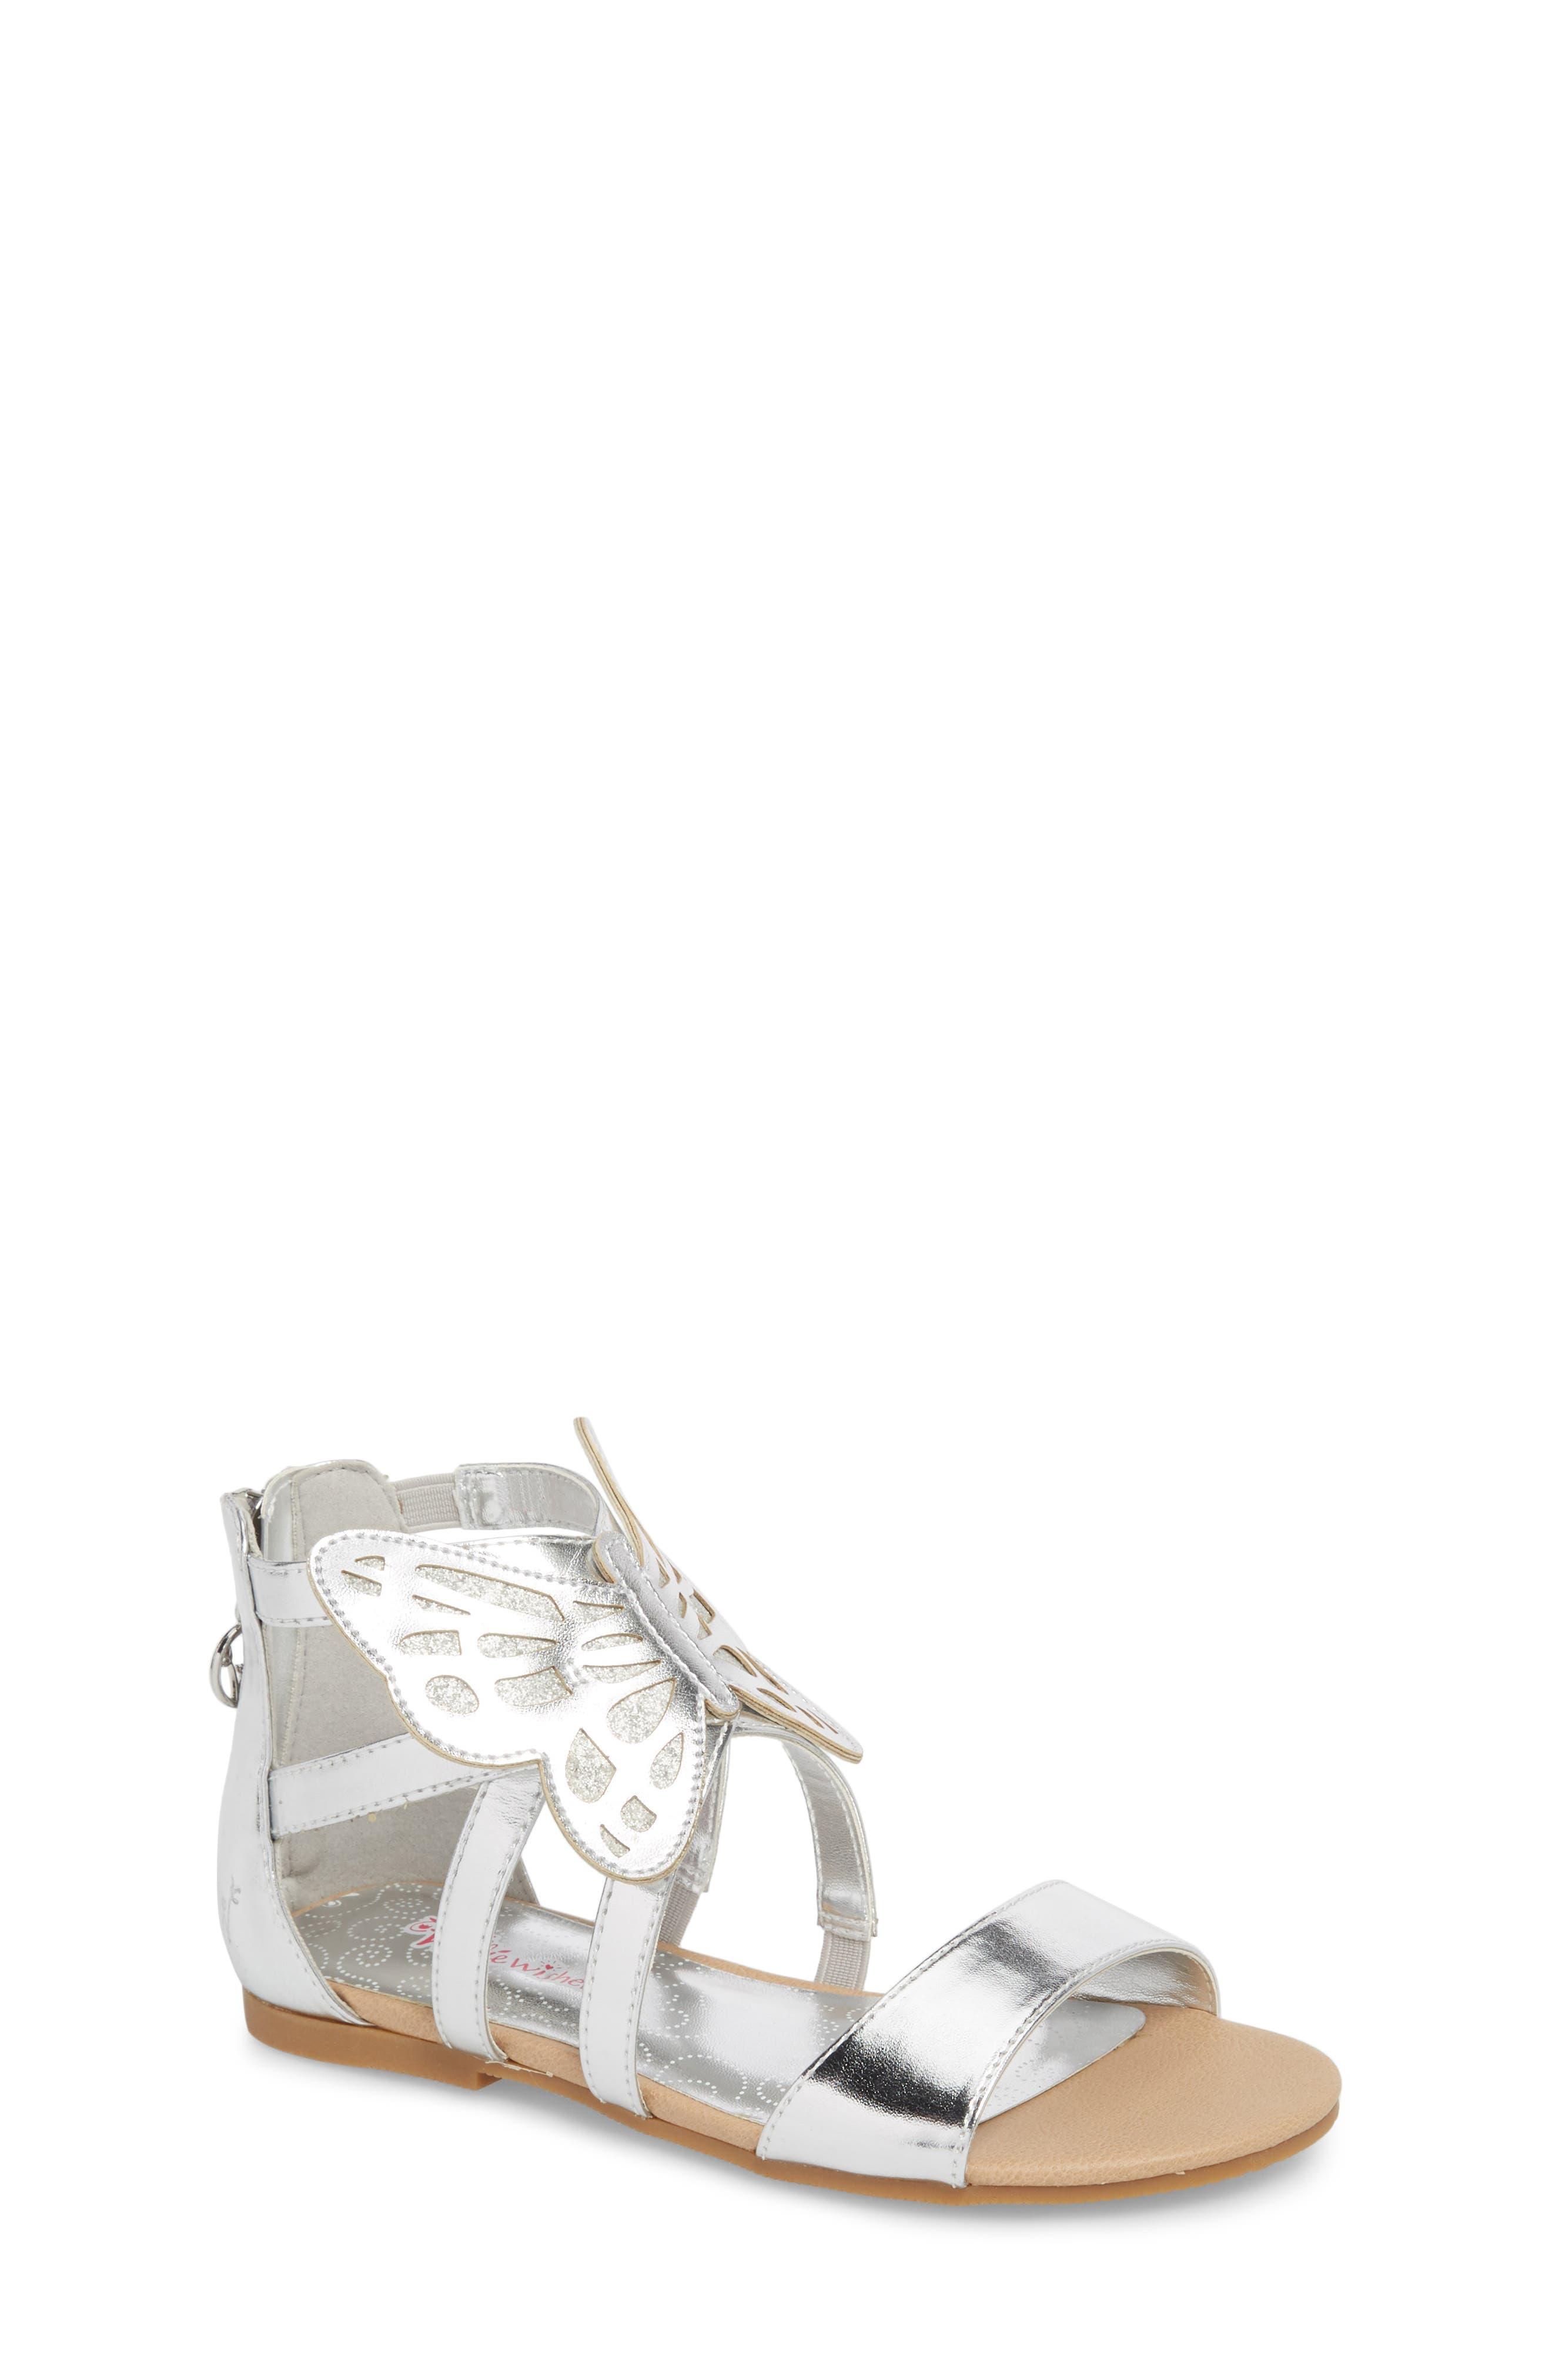 Willa Flutter Metallic Sandal,                             Main thumbnail 1, color,                             Silver Metallic